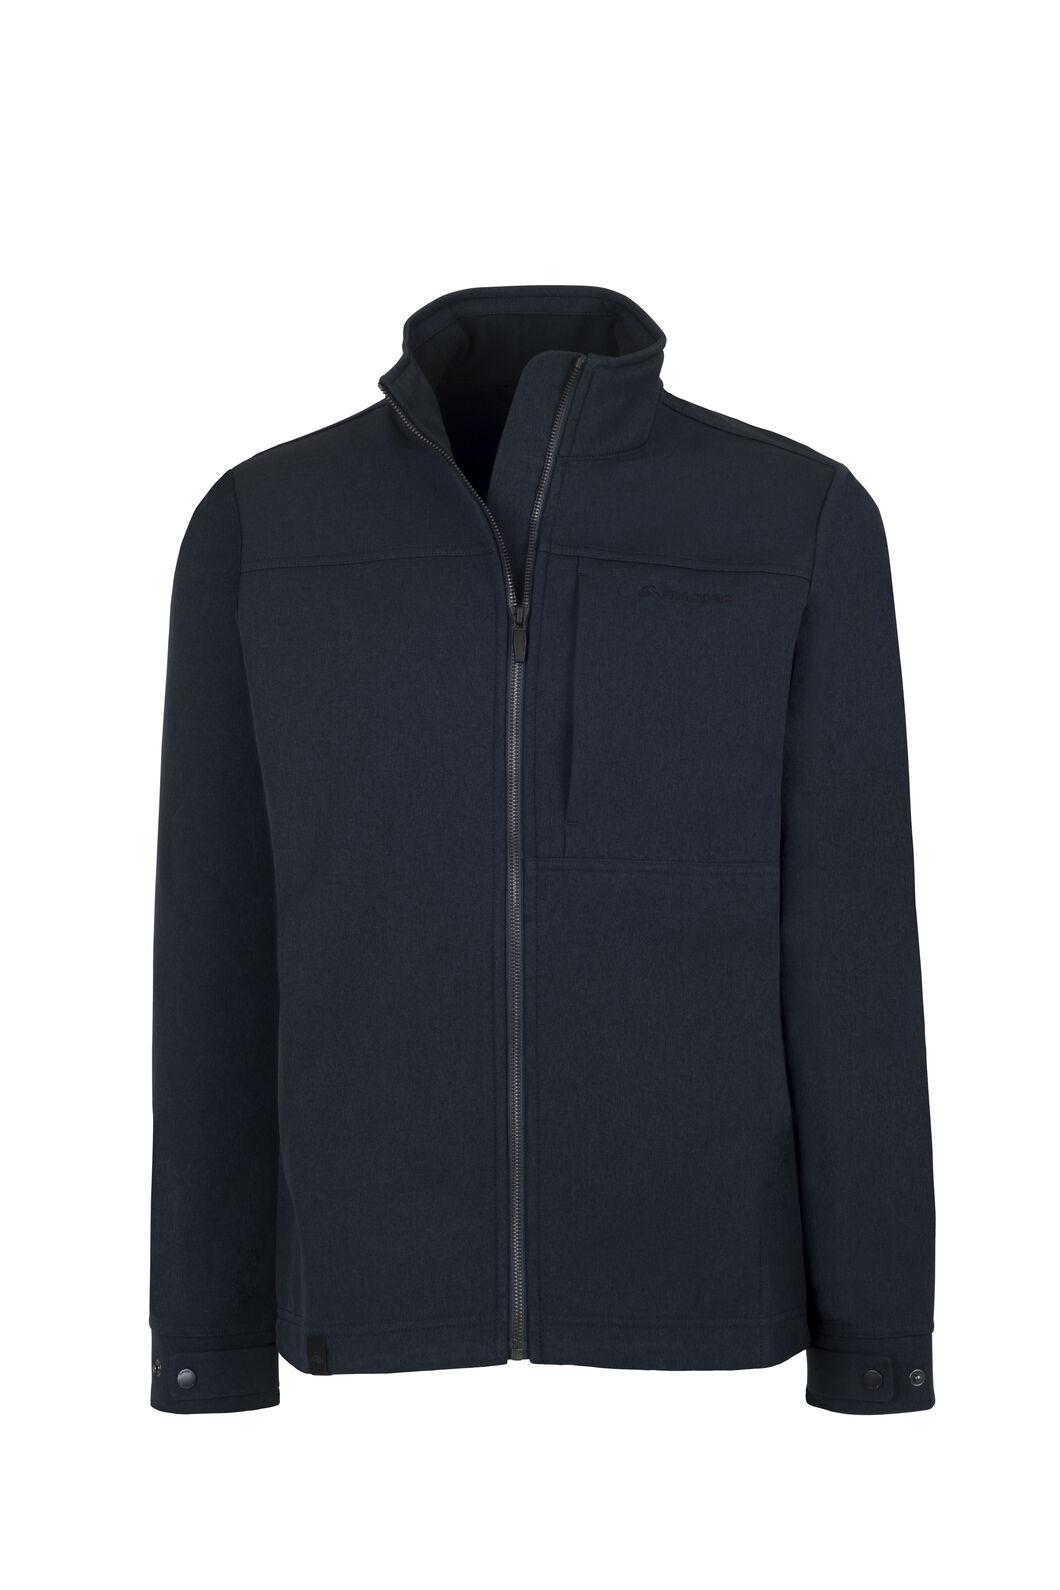 Macpac Chord Softshell Jacket — Men's, Carbon, hi-res